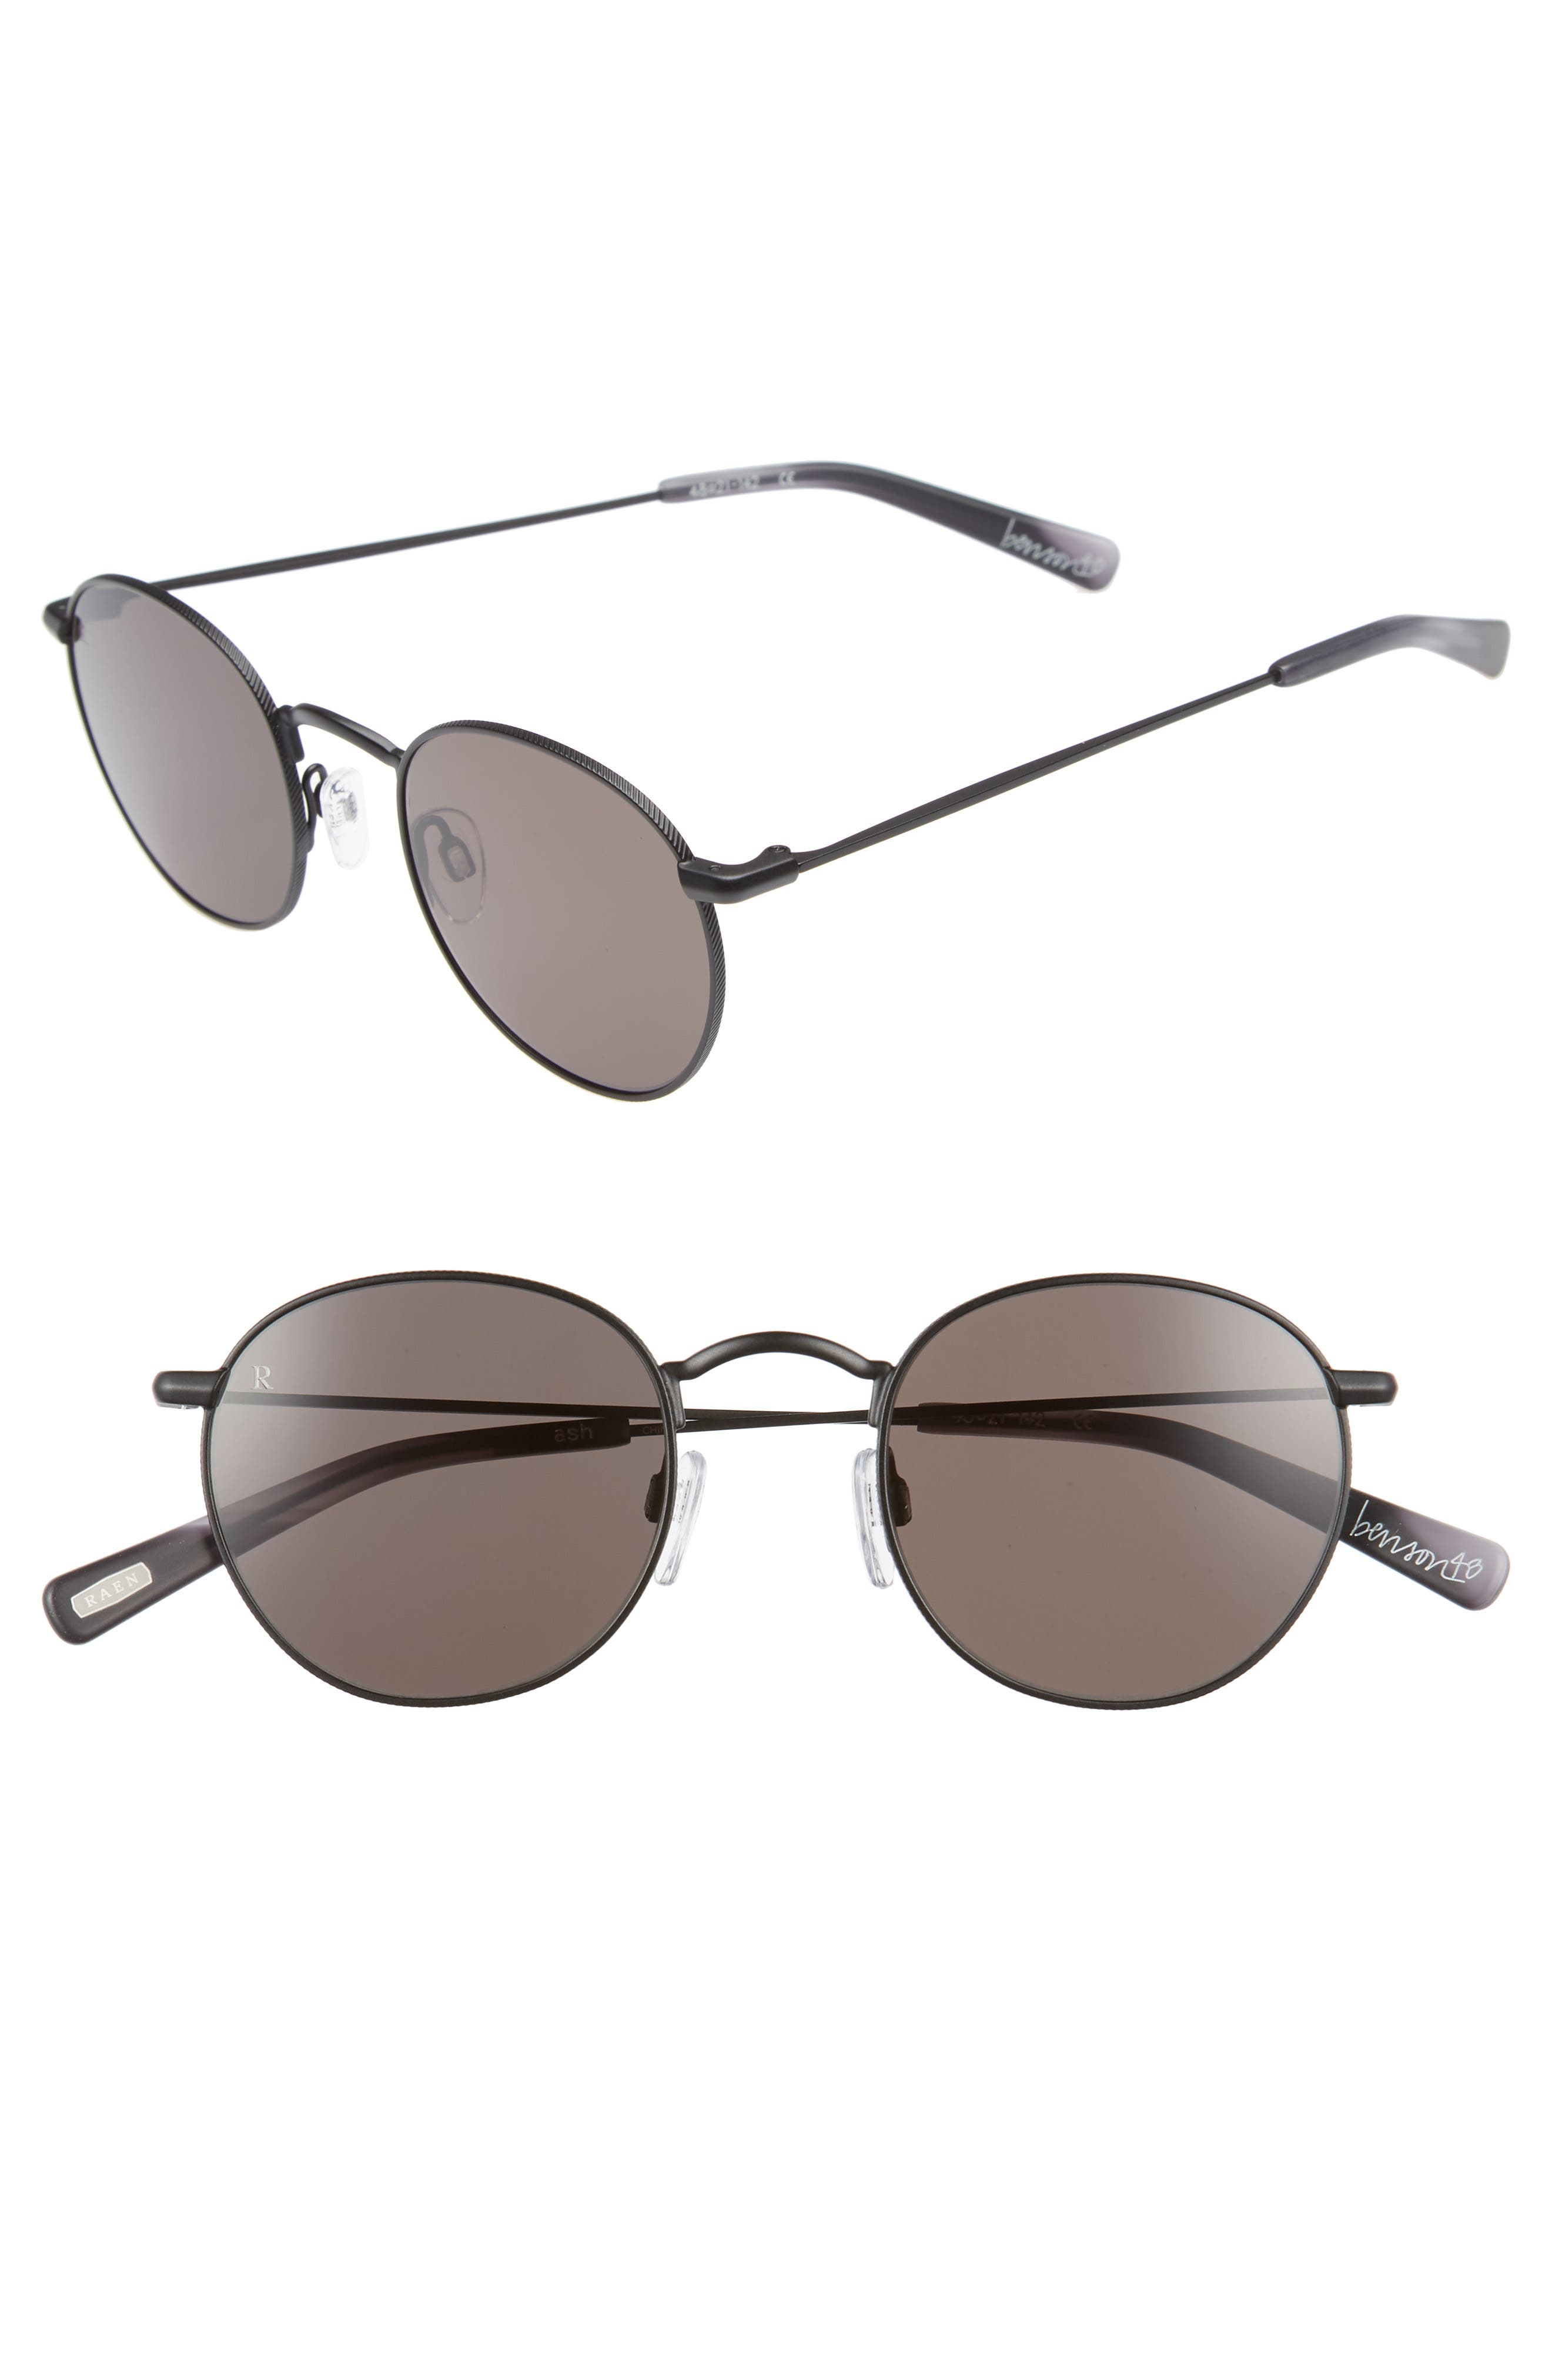 RAEN Benson 48Mm Sunglasses - Ash